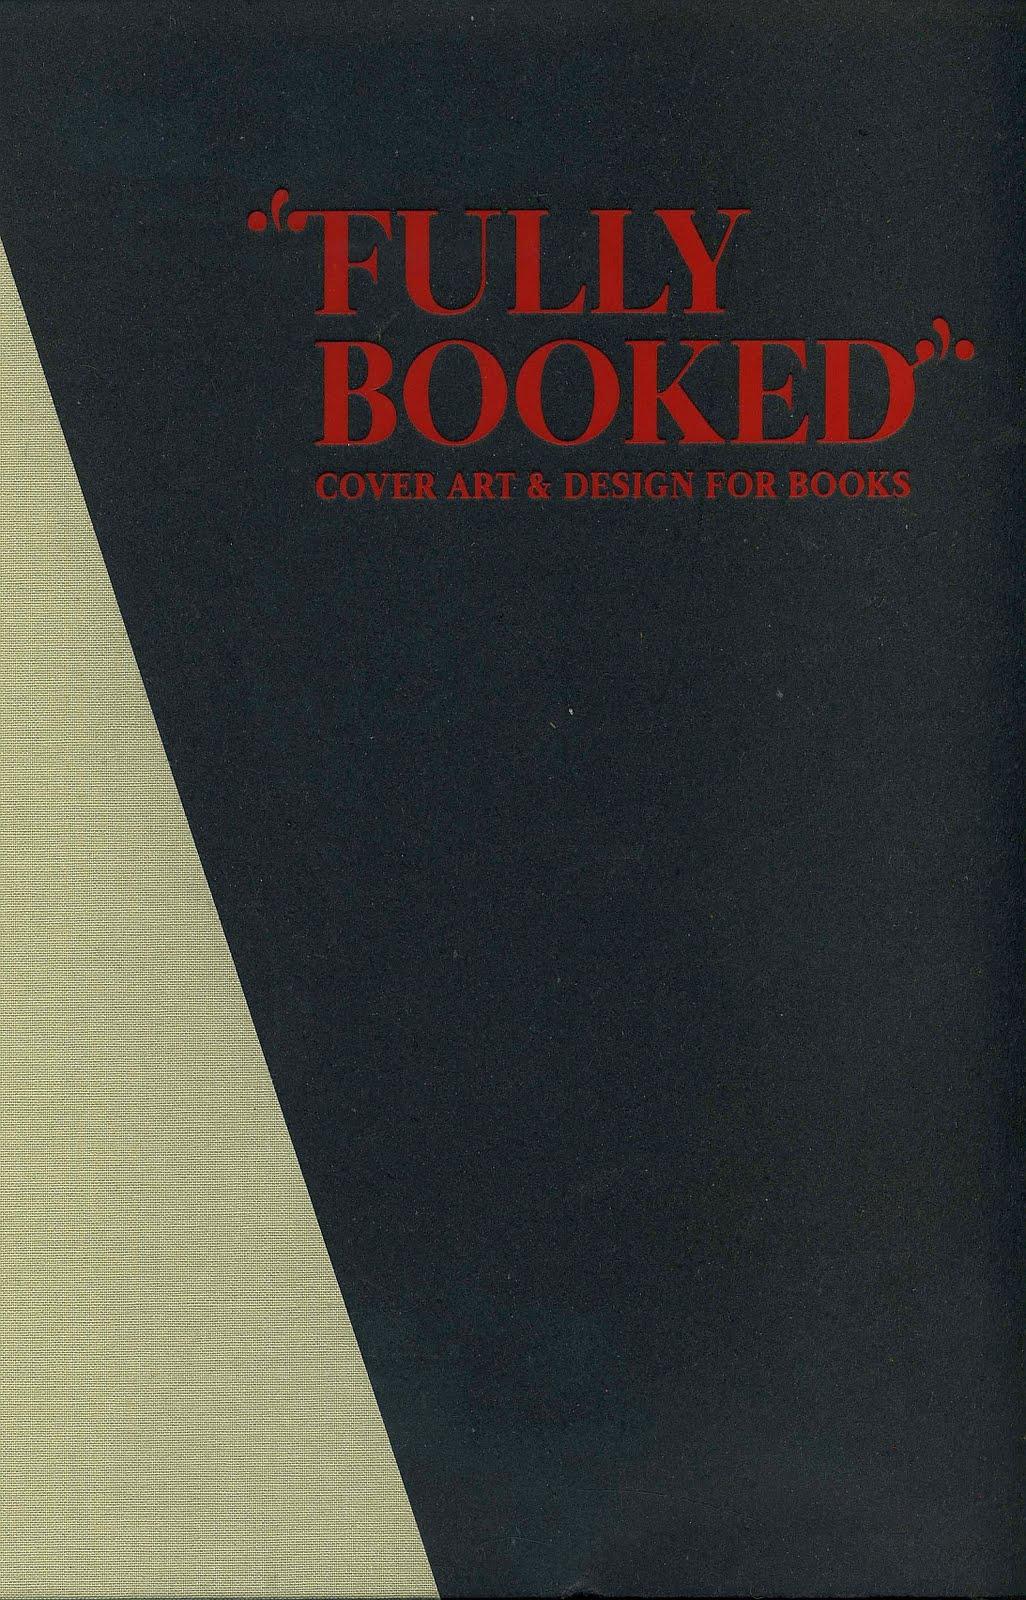 Book Cover Design Nz : Transpress nz book covers